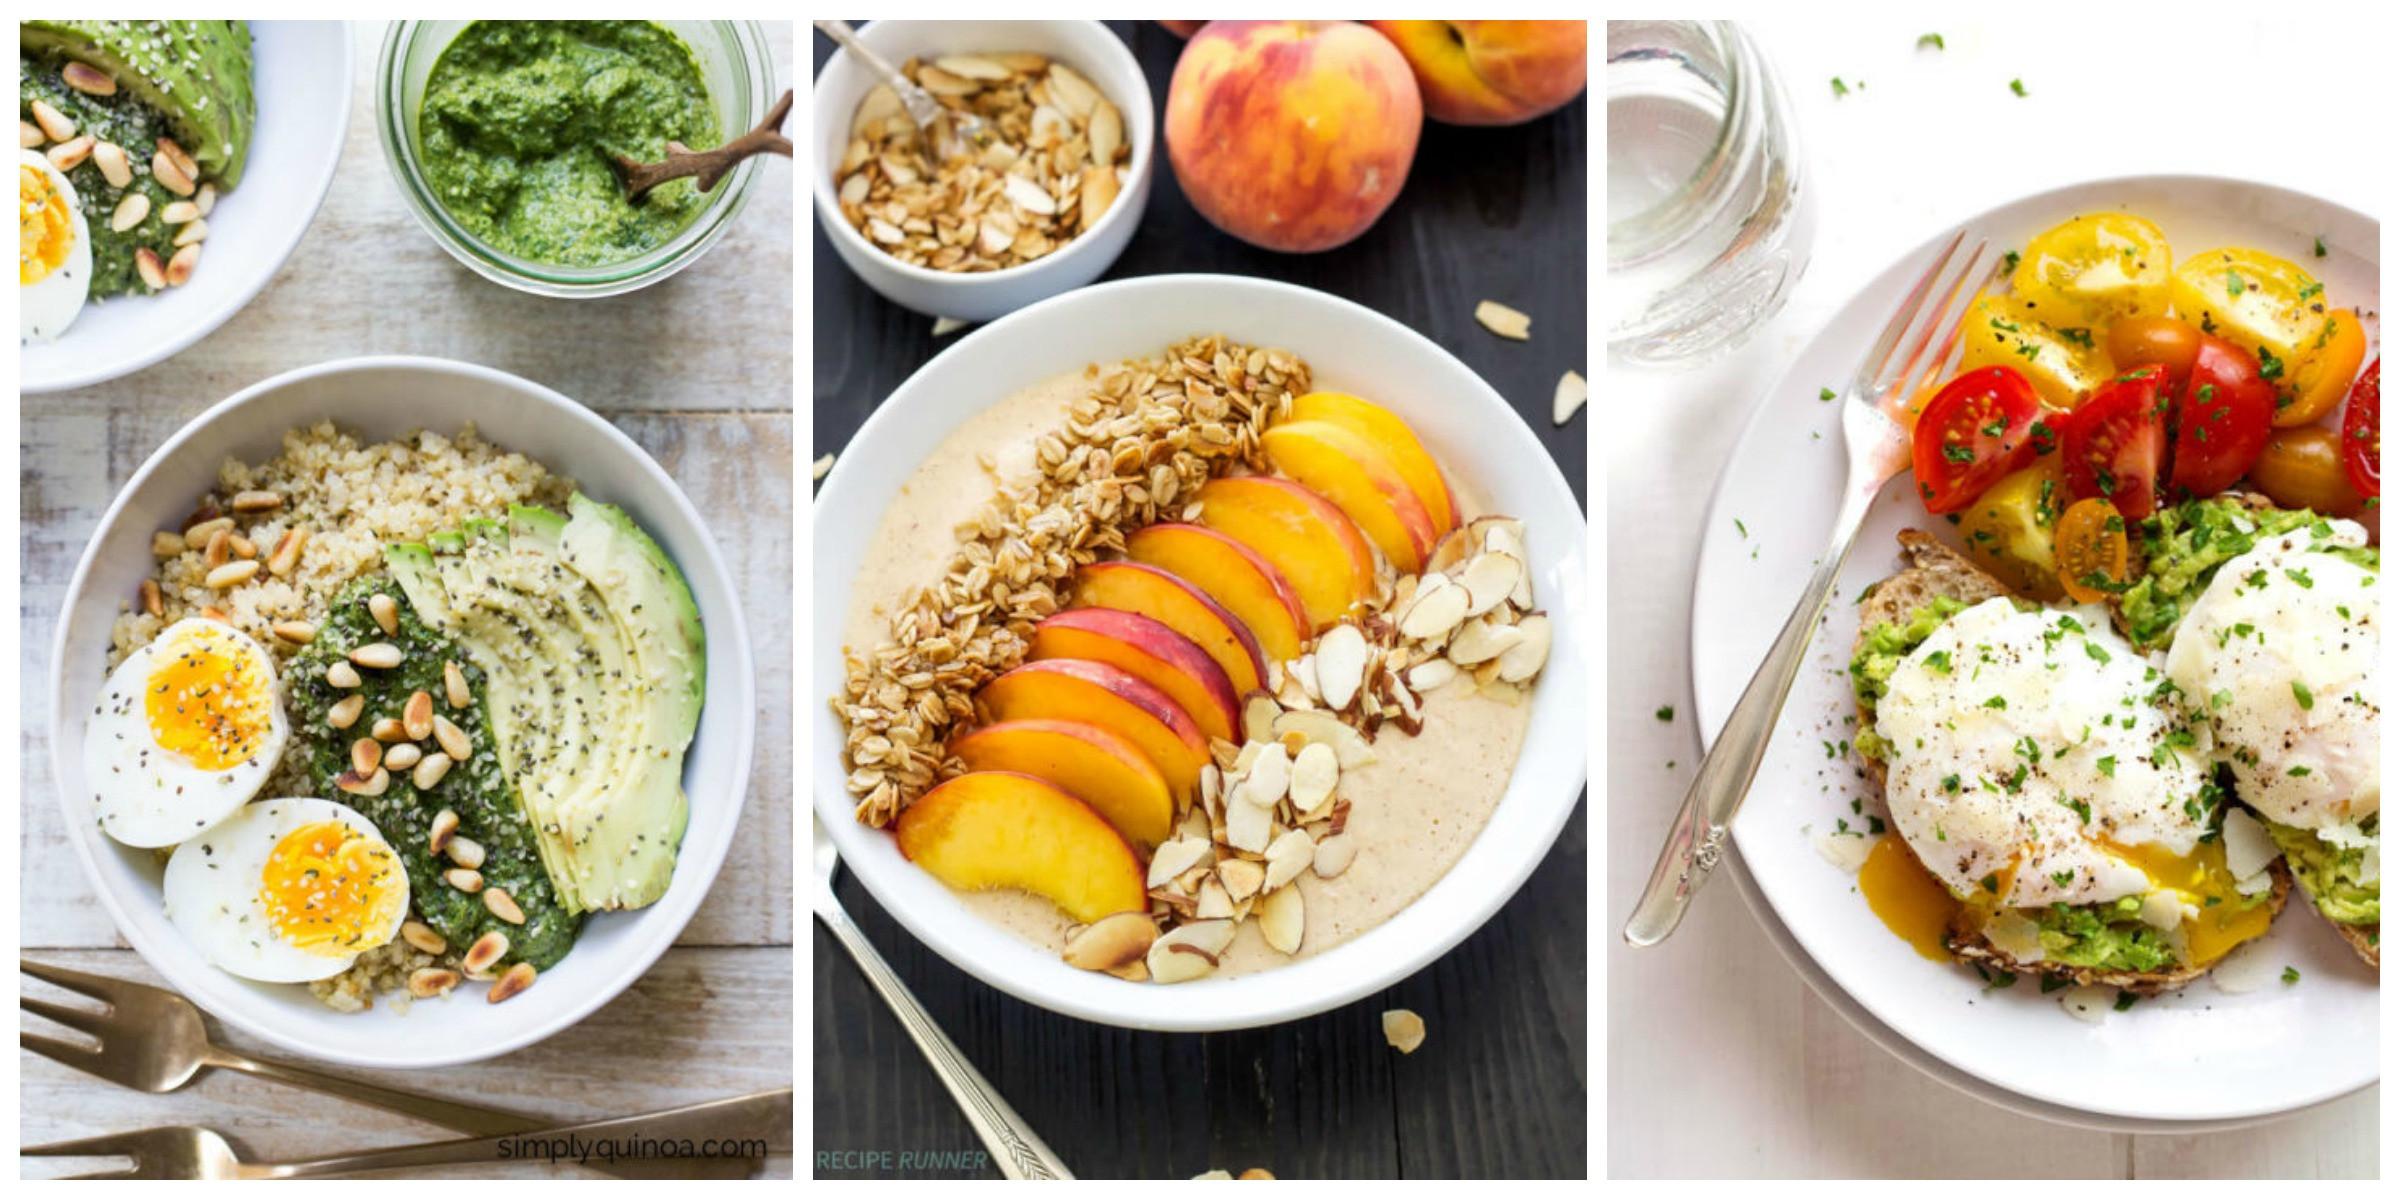 Good Healthy Breakfast  20 Best Healthy Breakfast Food Ideas Recipes for Healthy